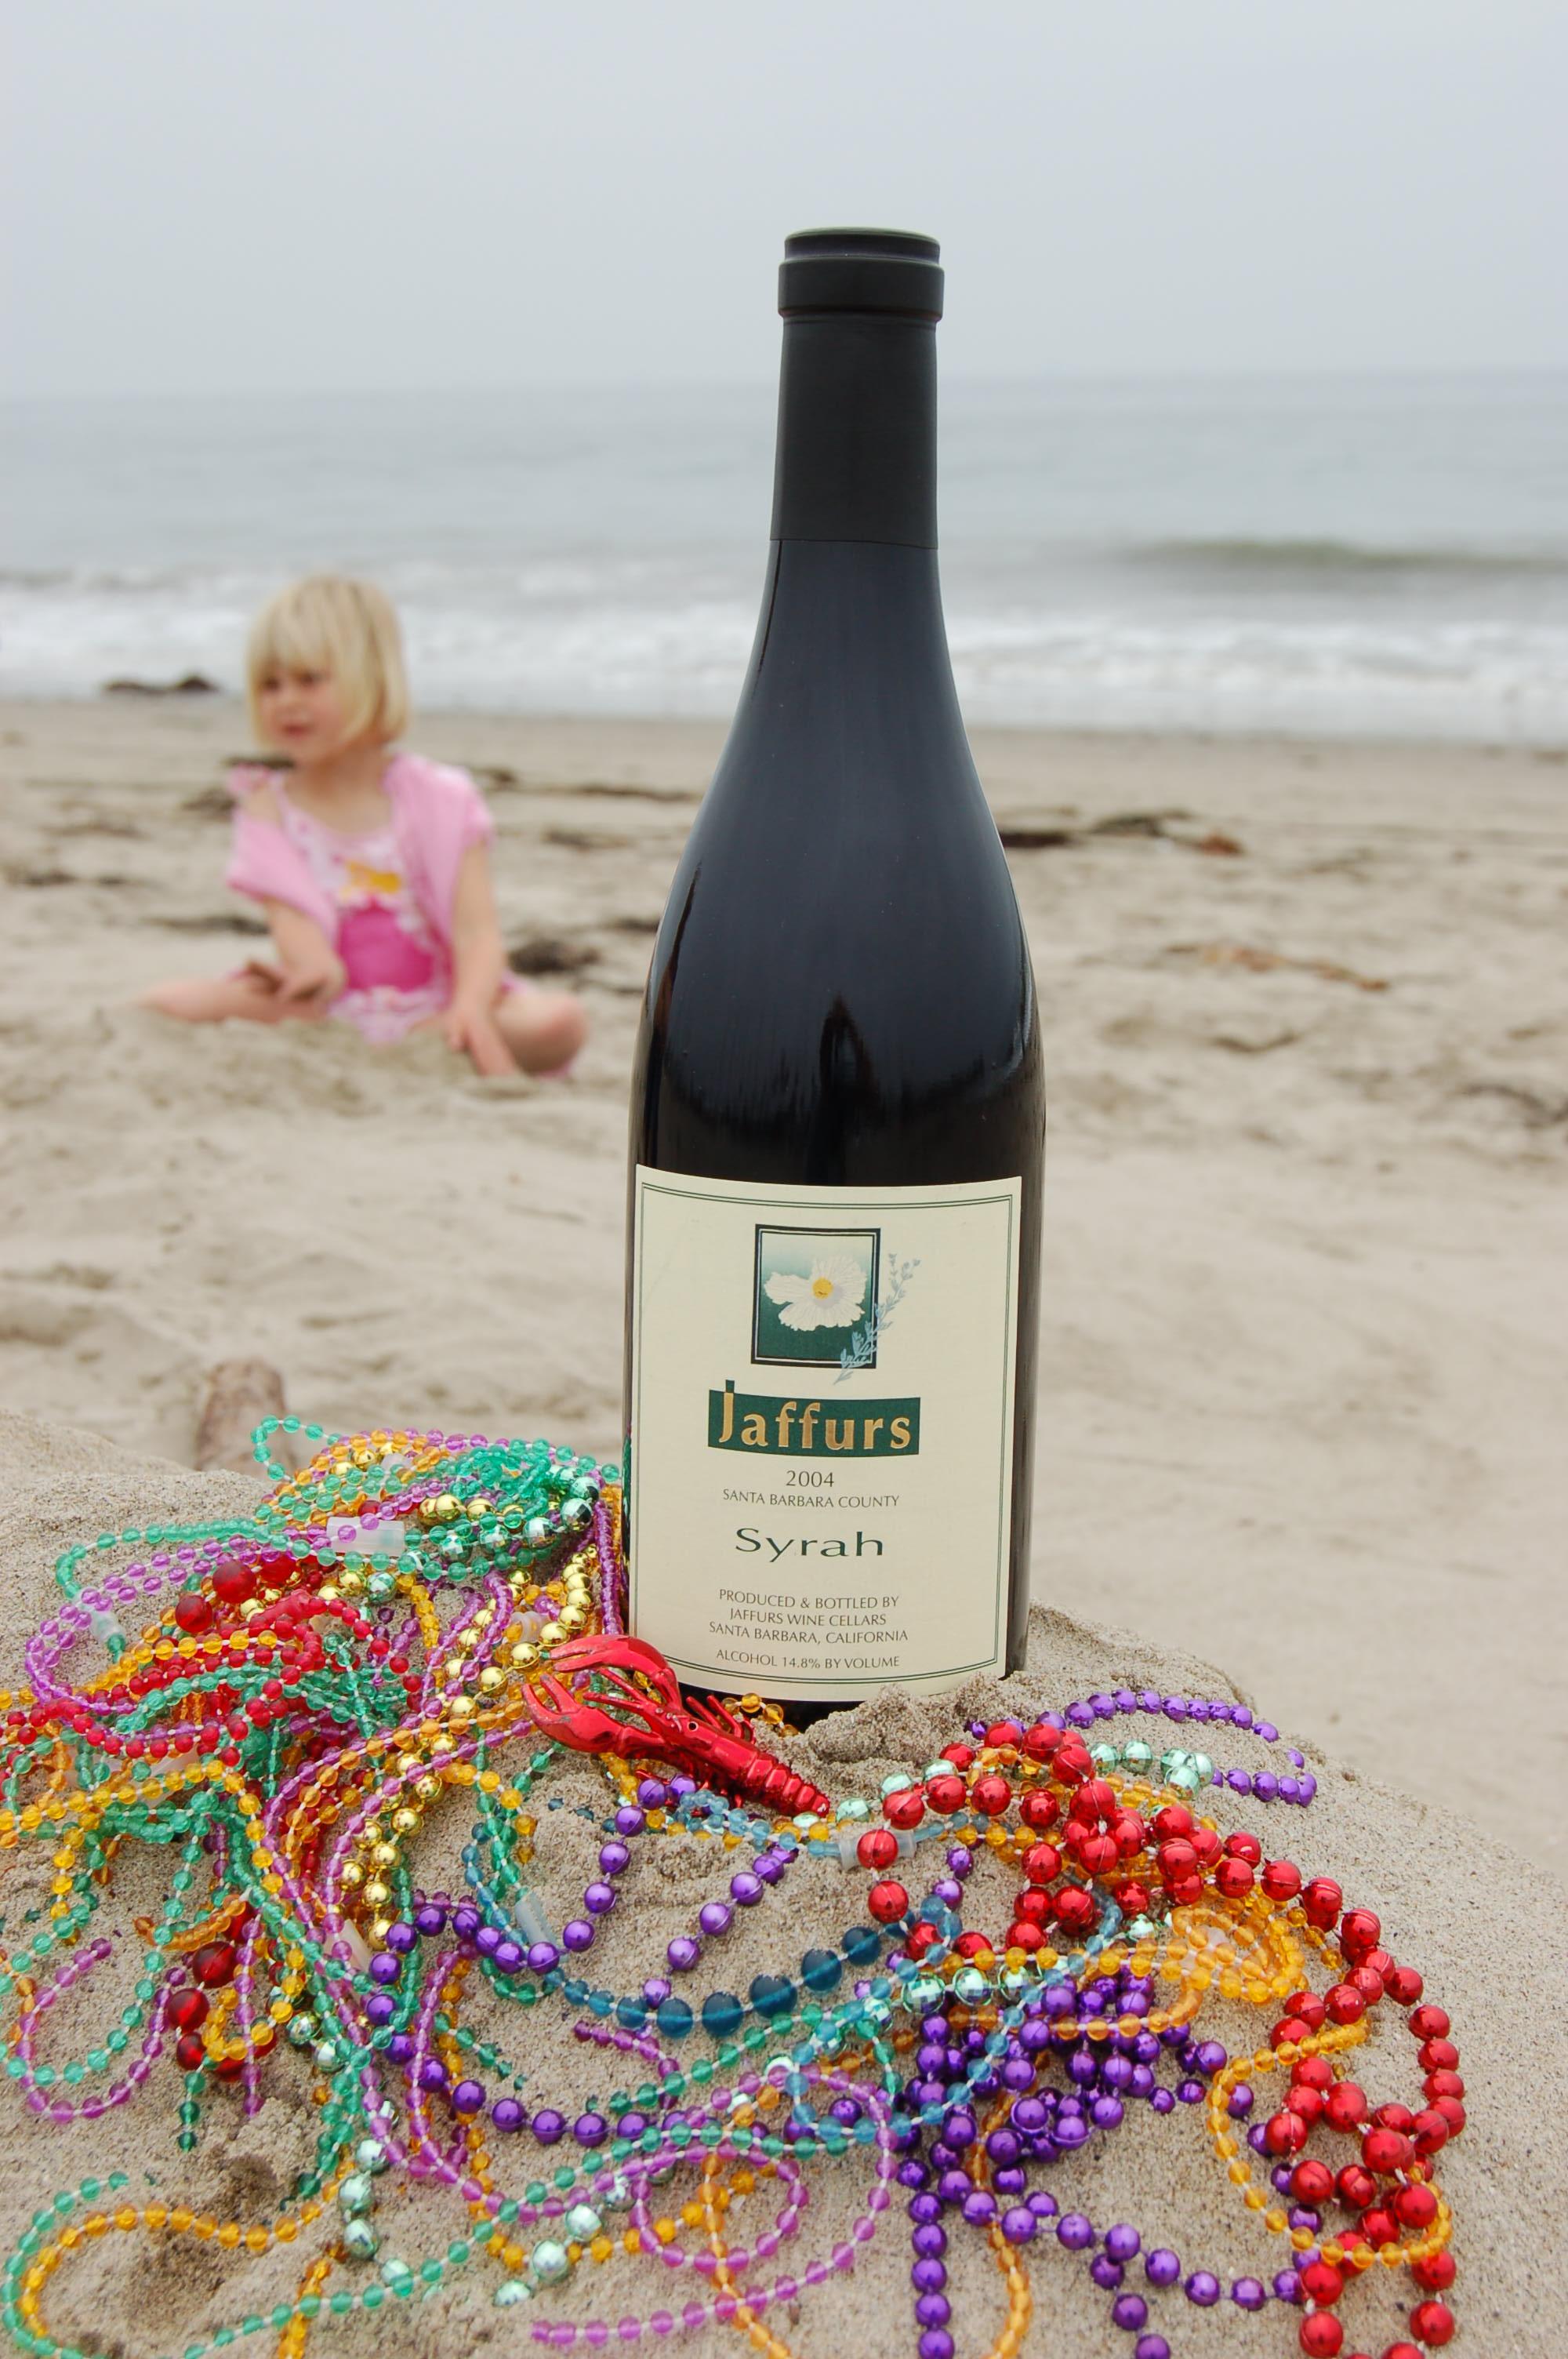 syrah bottle on beach.JPG